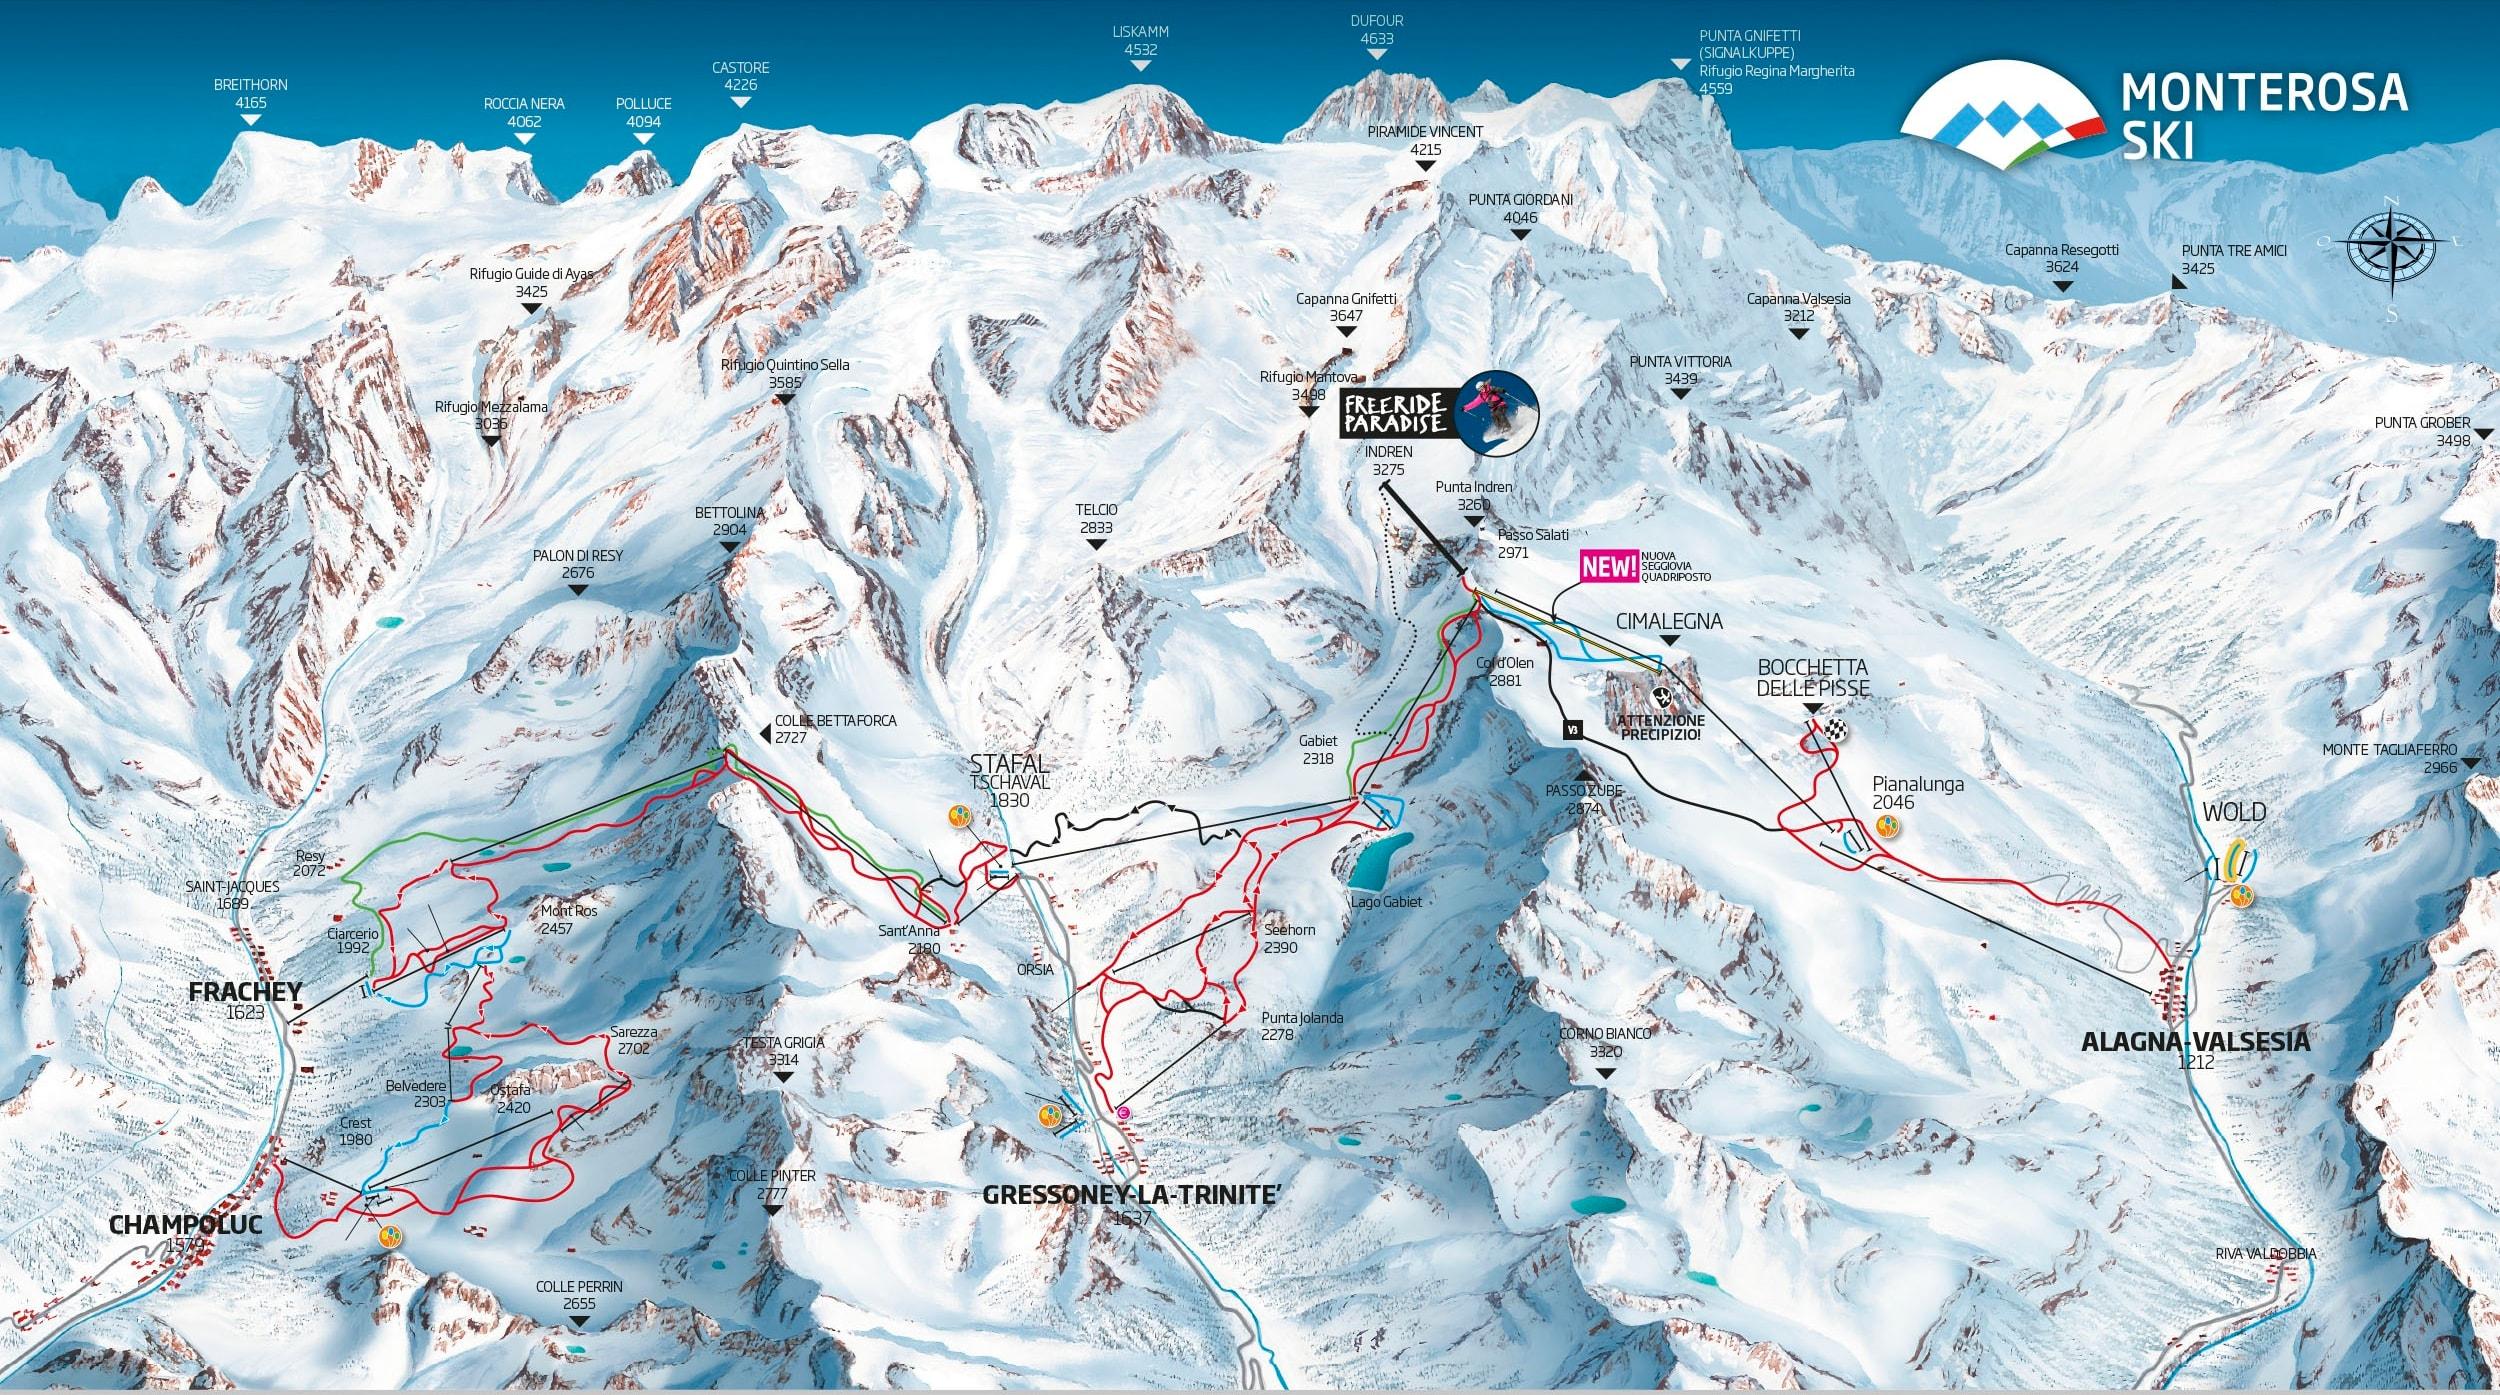 Alagna Piste / Trail Map